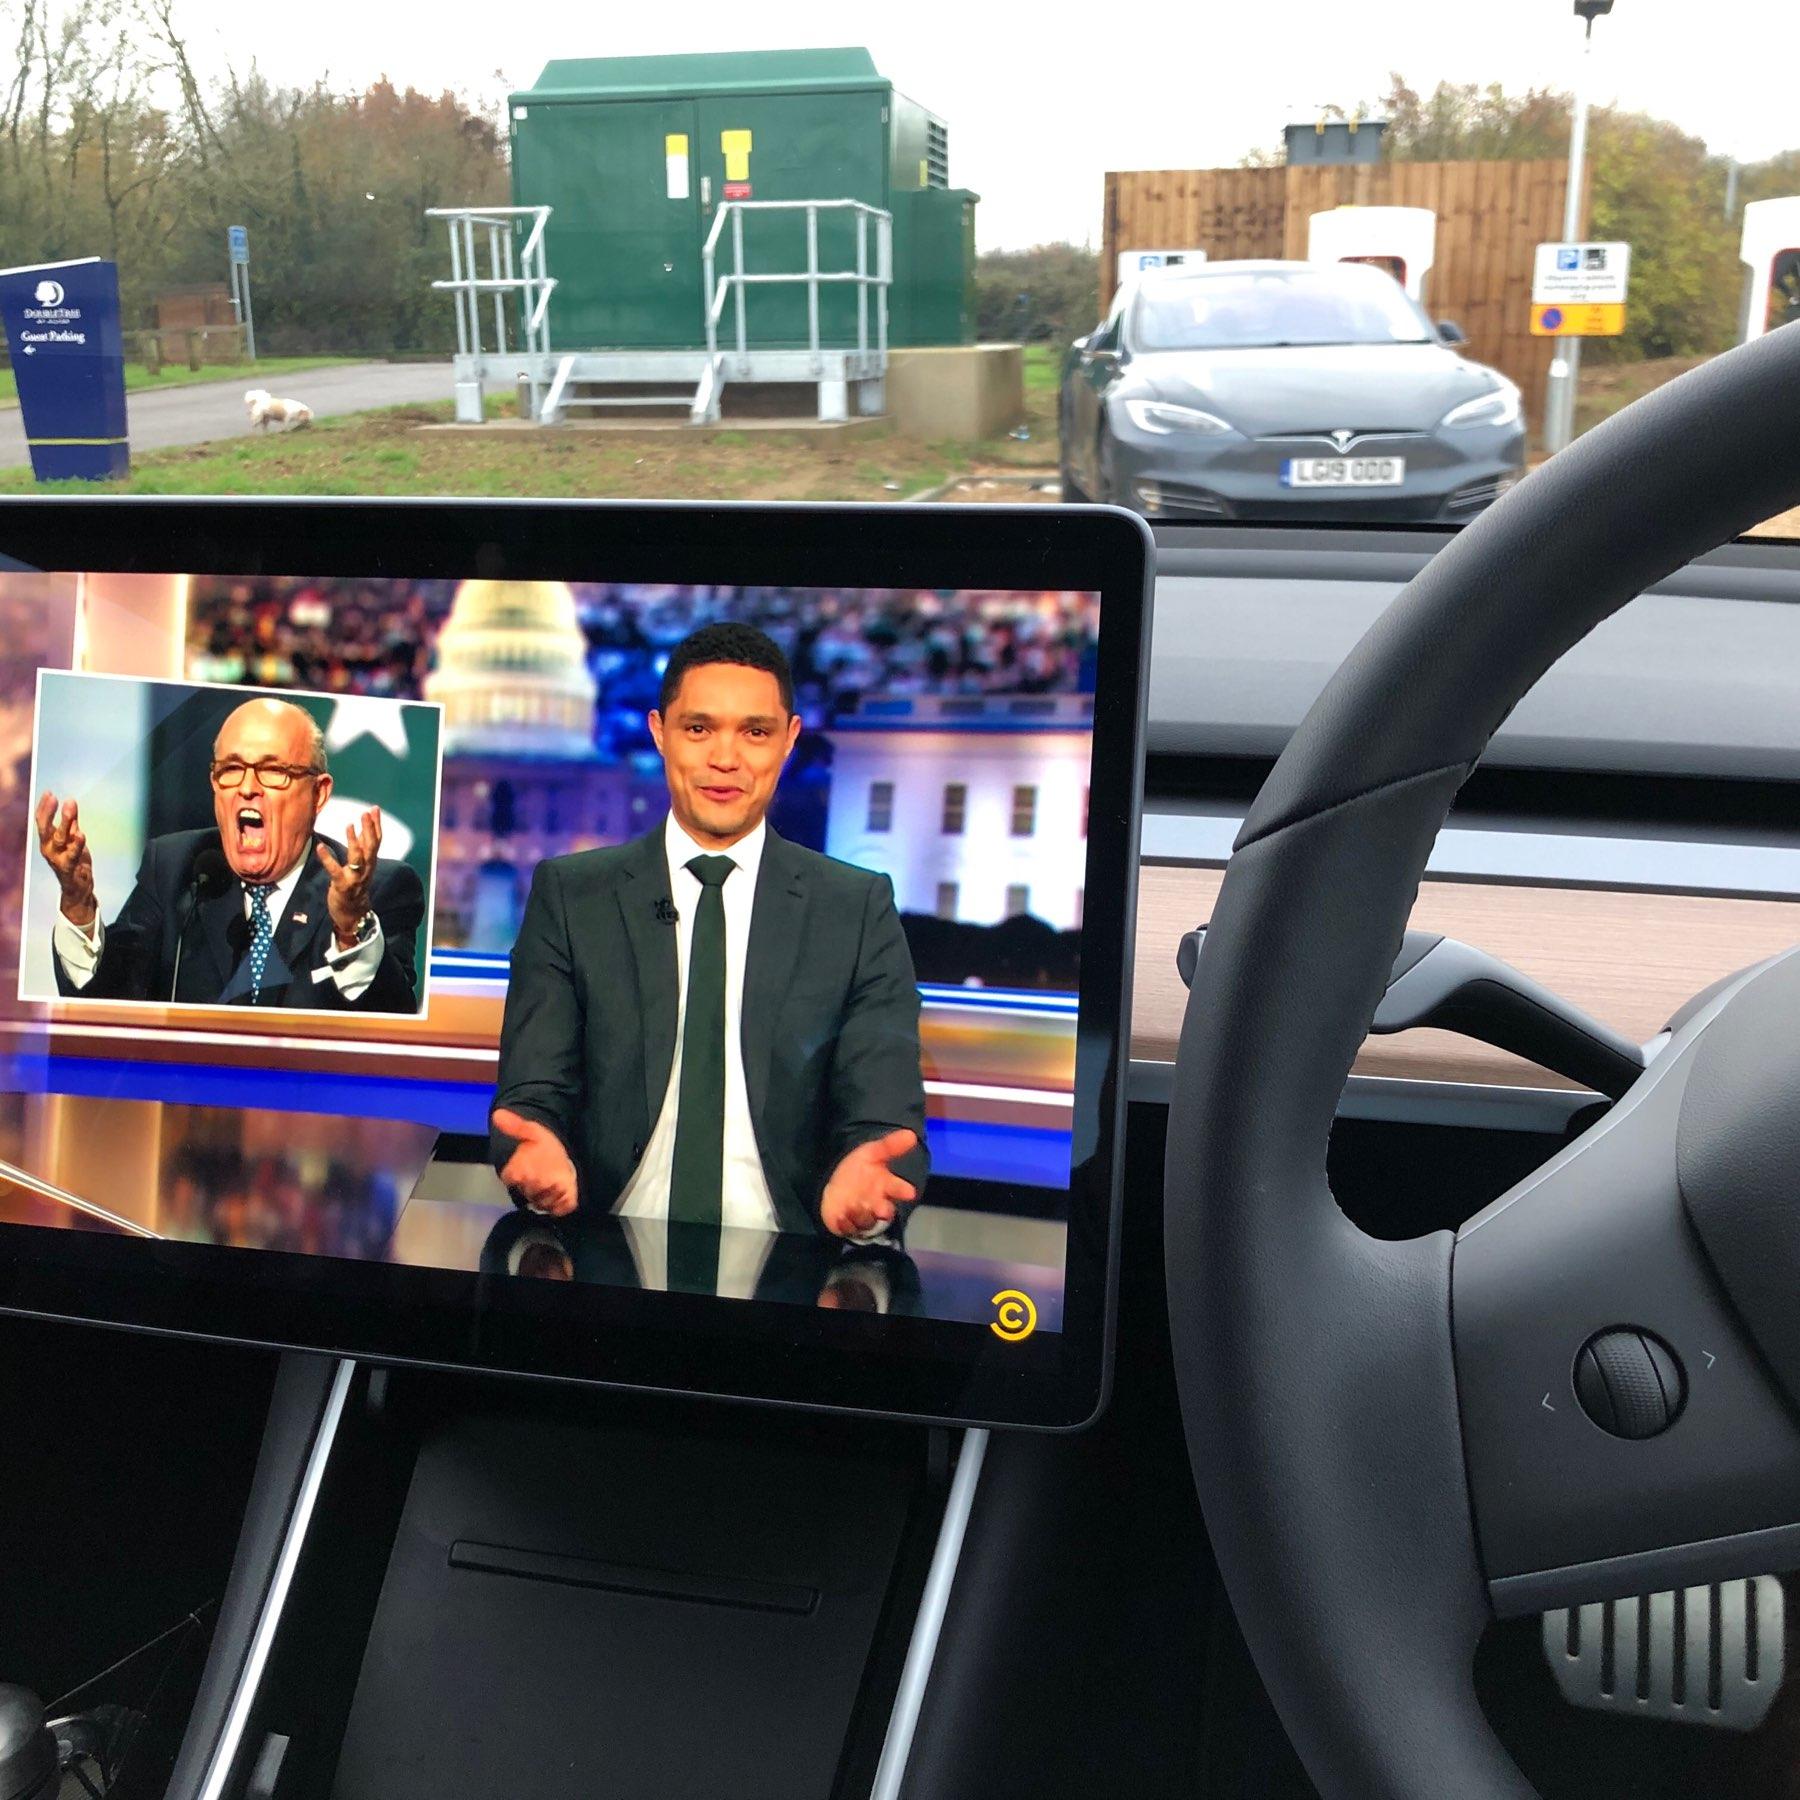 Watching YouTube in Tesla